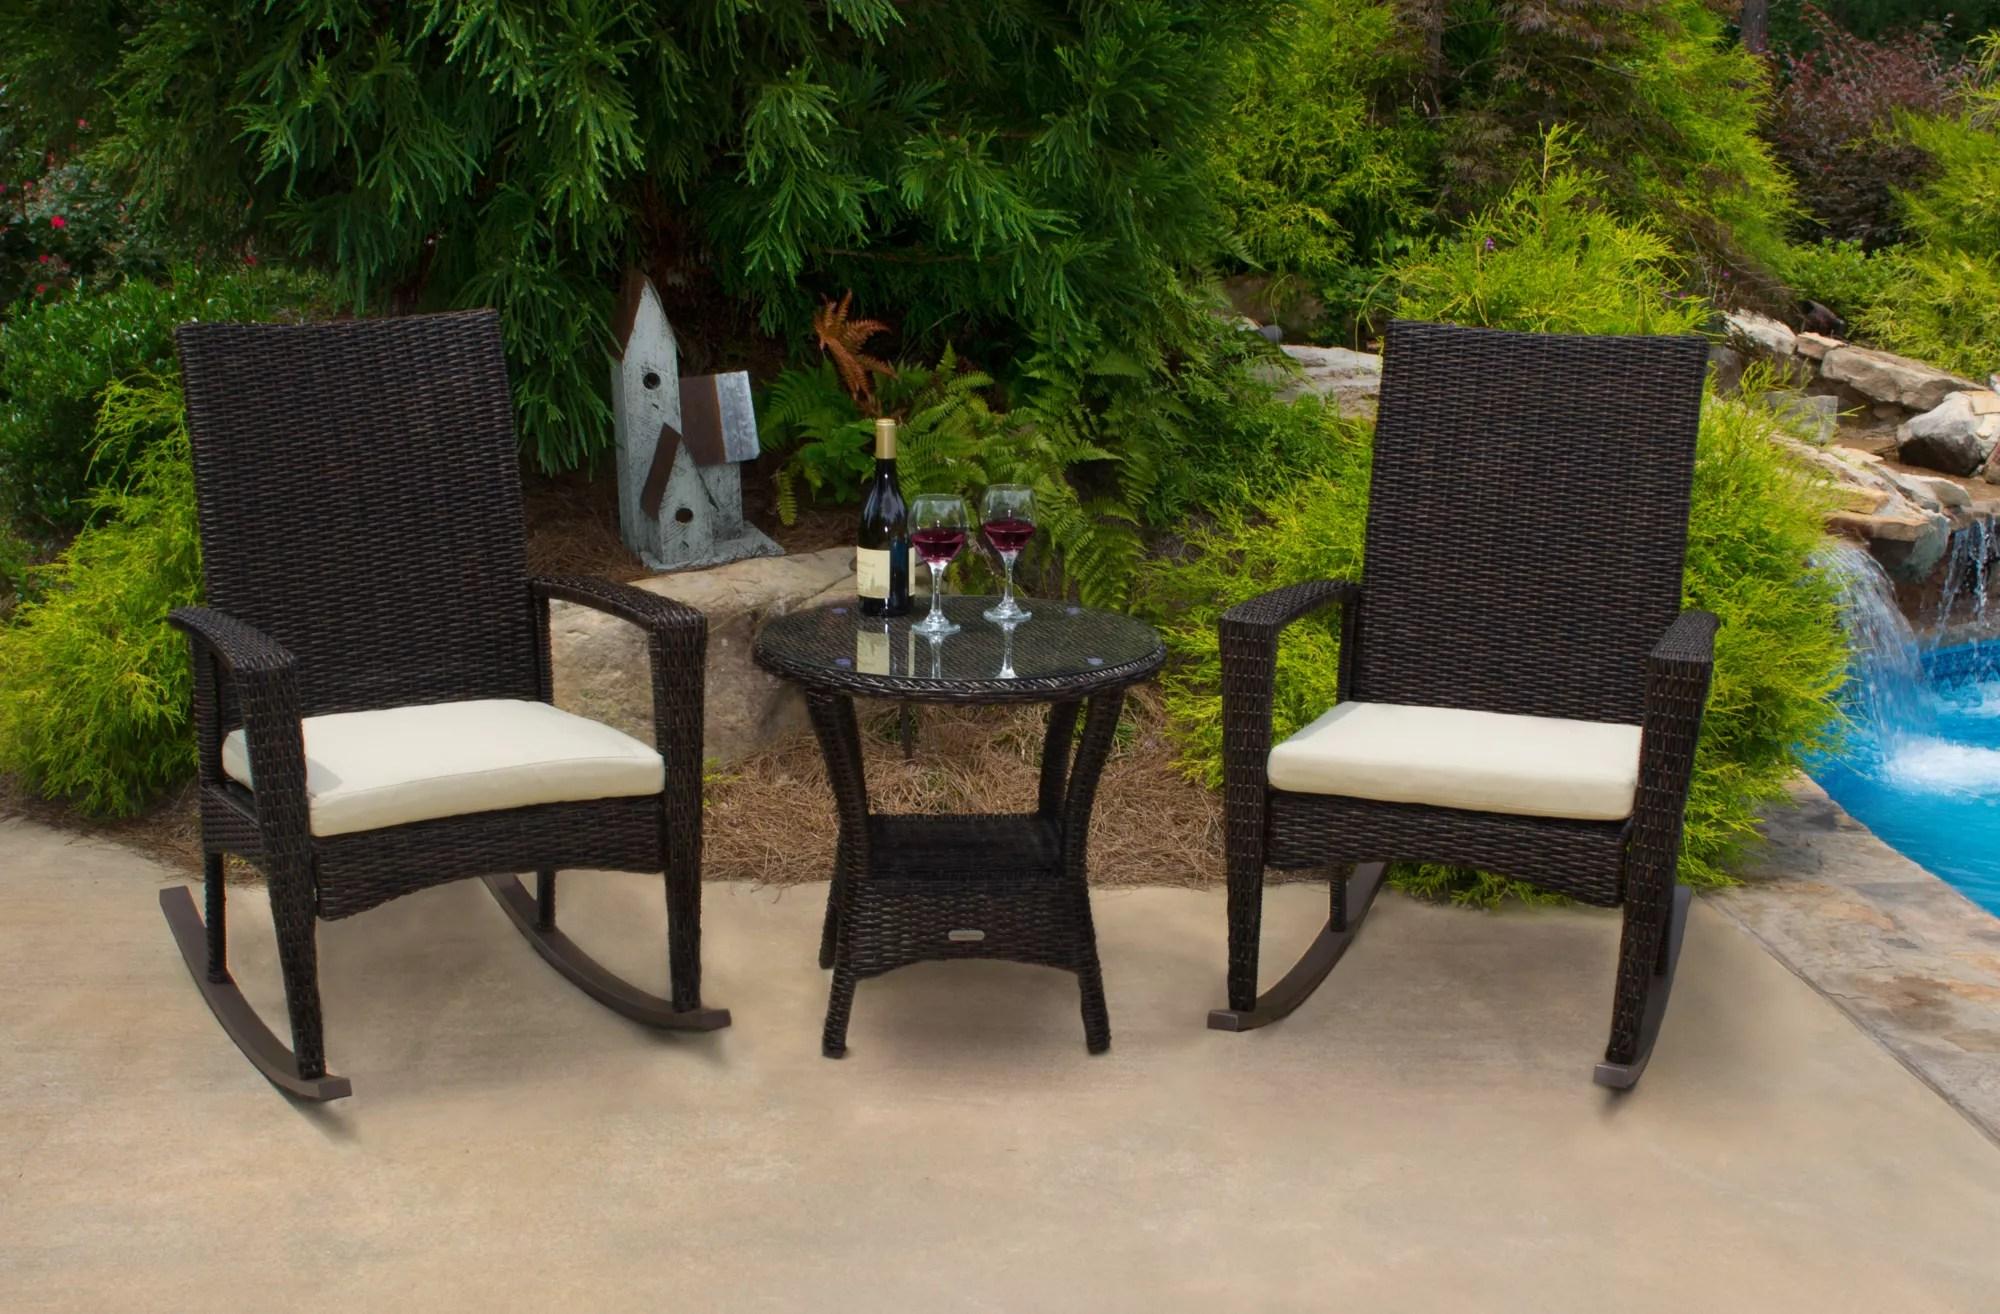 tortuga outdoor bayview 3 pc rocking chair set pecan